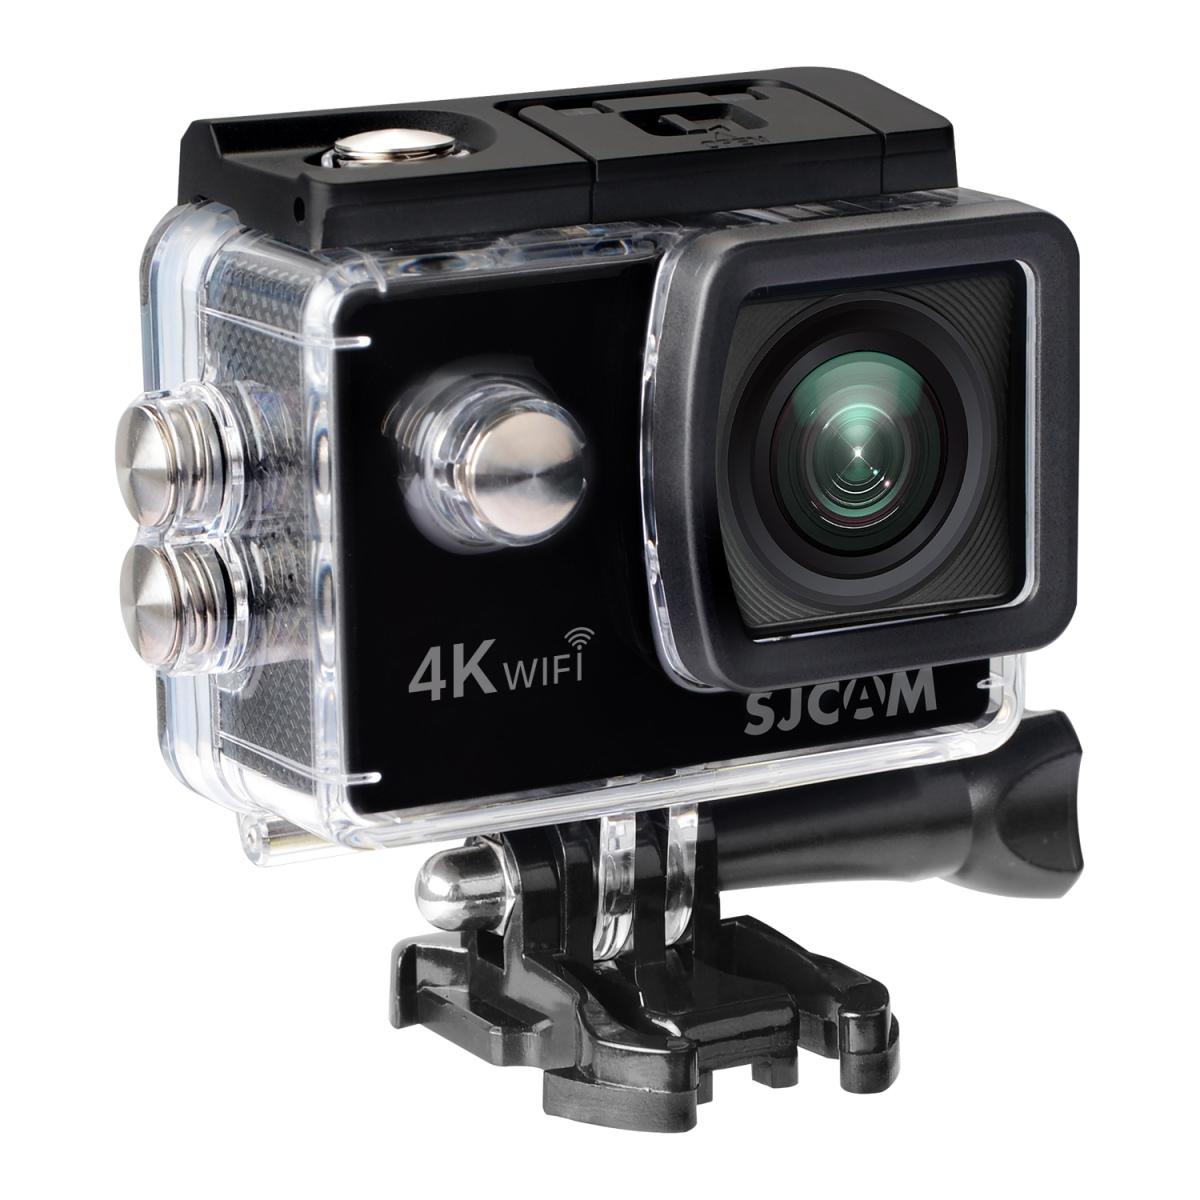 sj4000 air 4k action camera sjcam sj4000 wifi air is. Black Bedroom Furniture Sets. Home Design Ideas